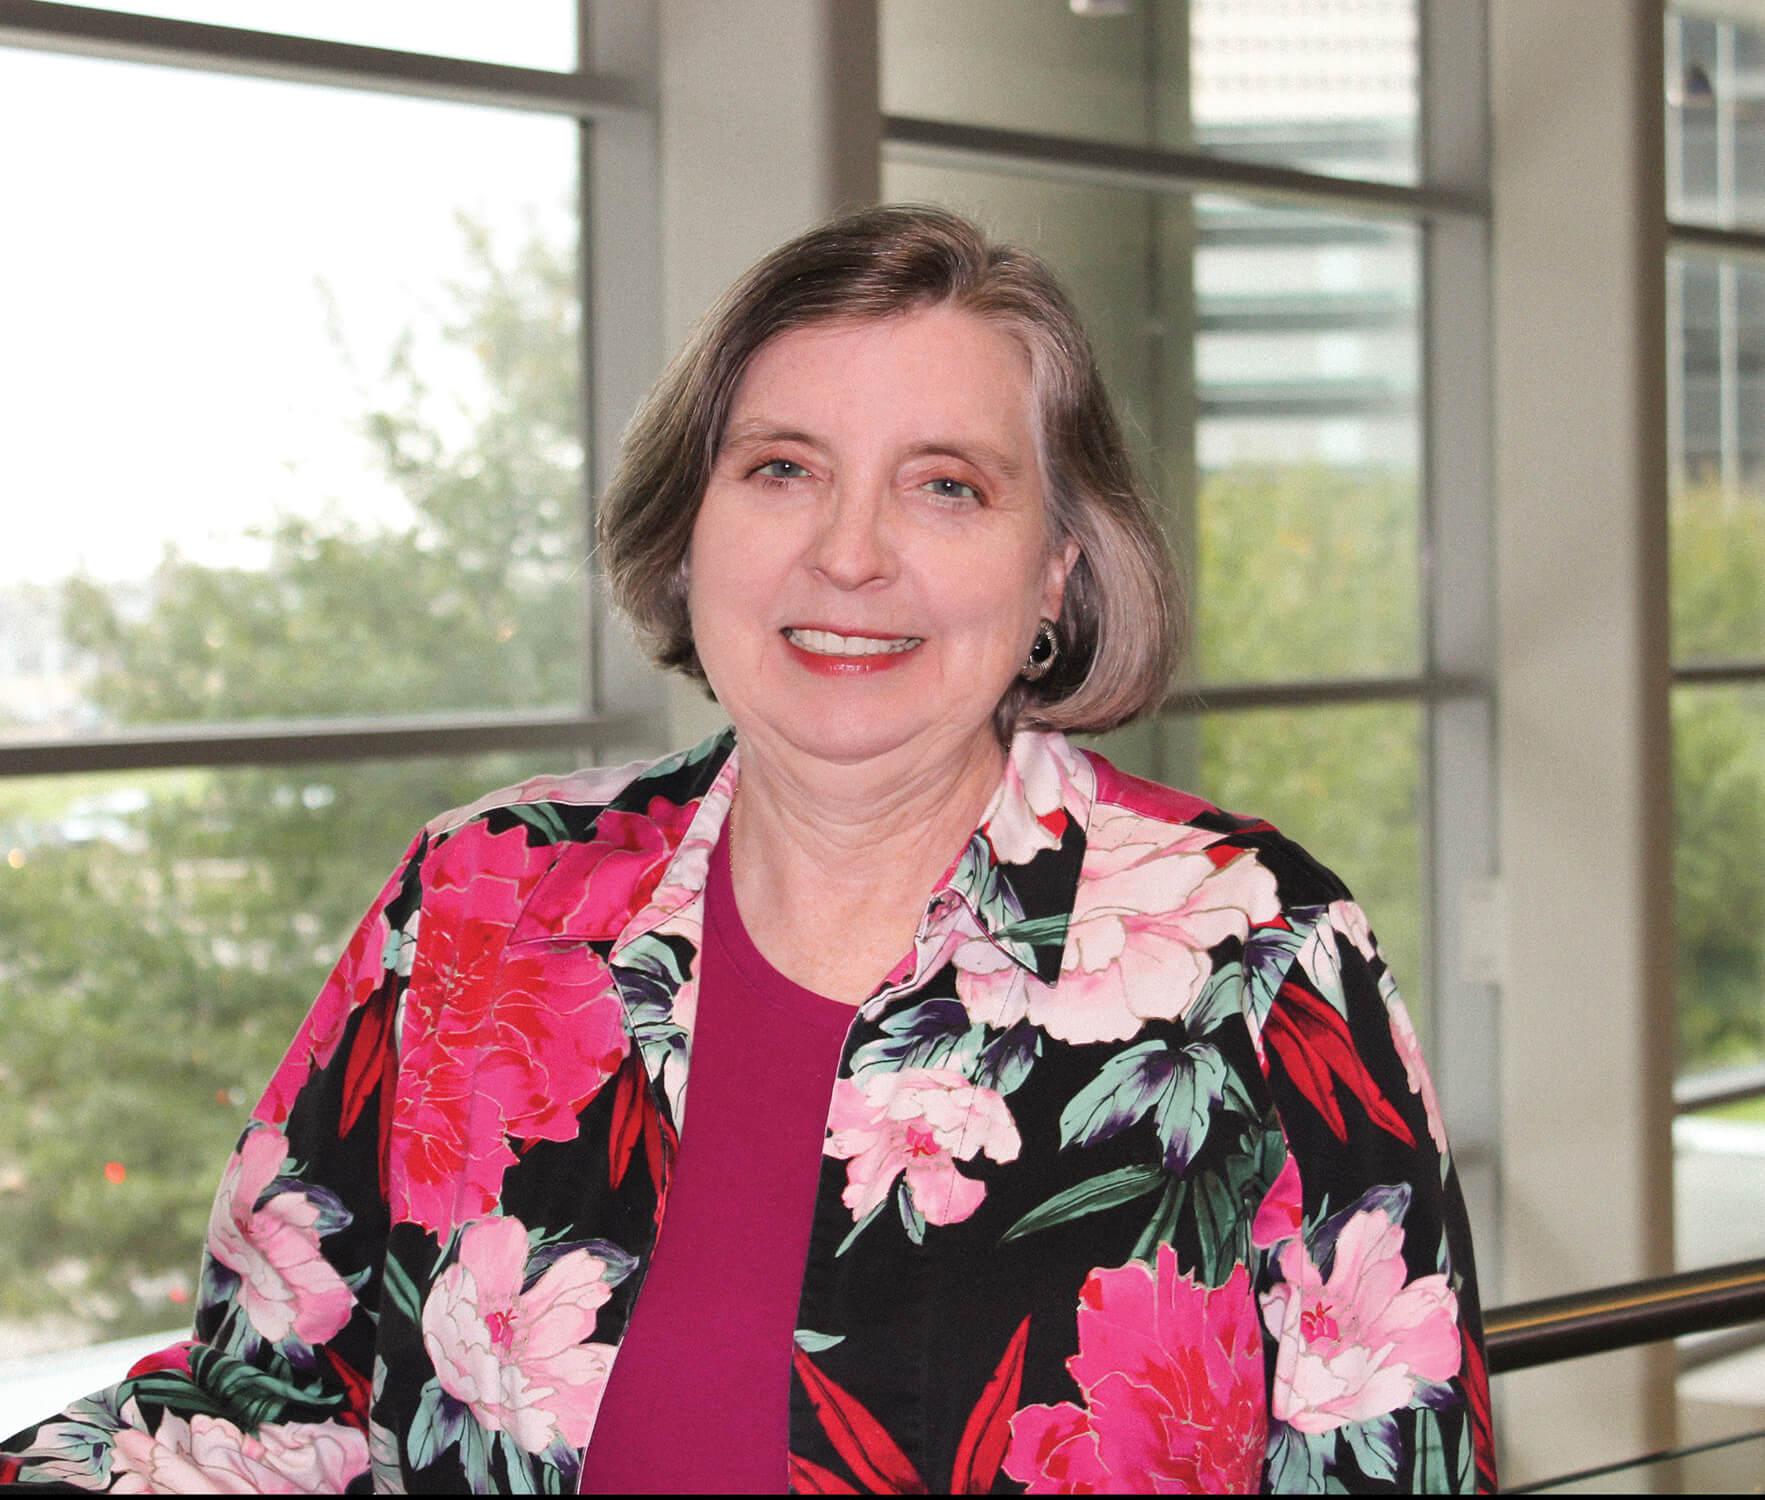 Ainslie Nibert, Ph.D., is associate dean of the Texas Woman's University nursing program in Houston.